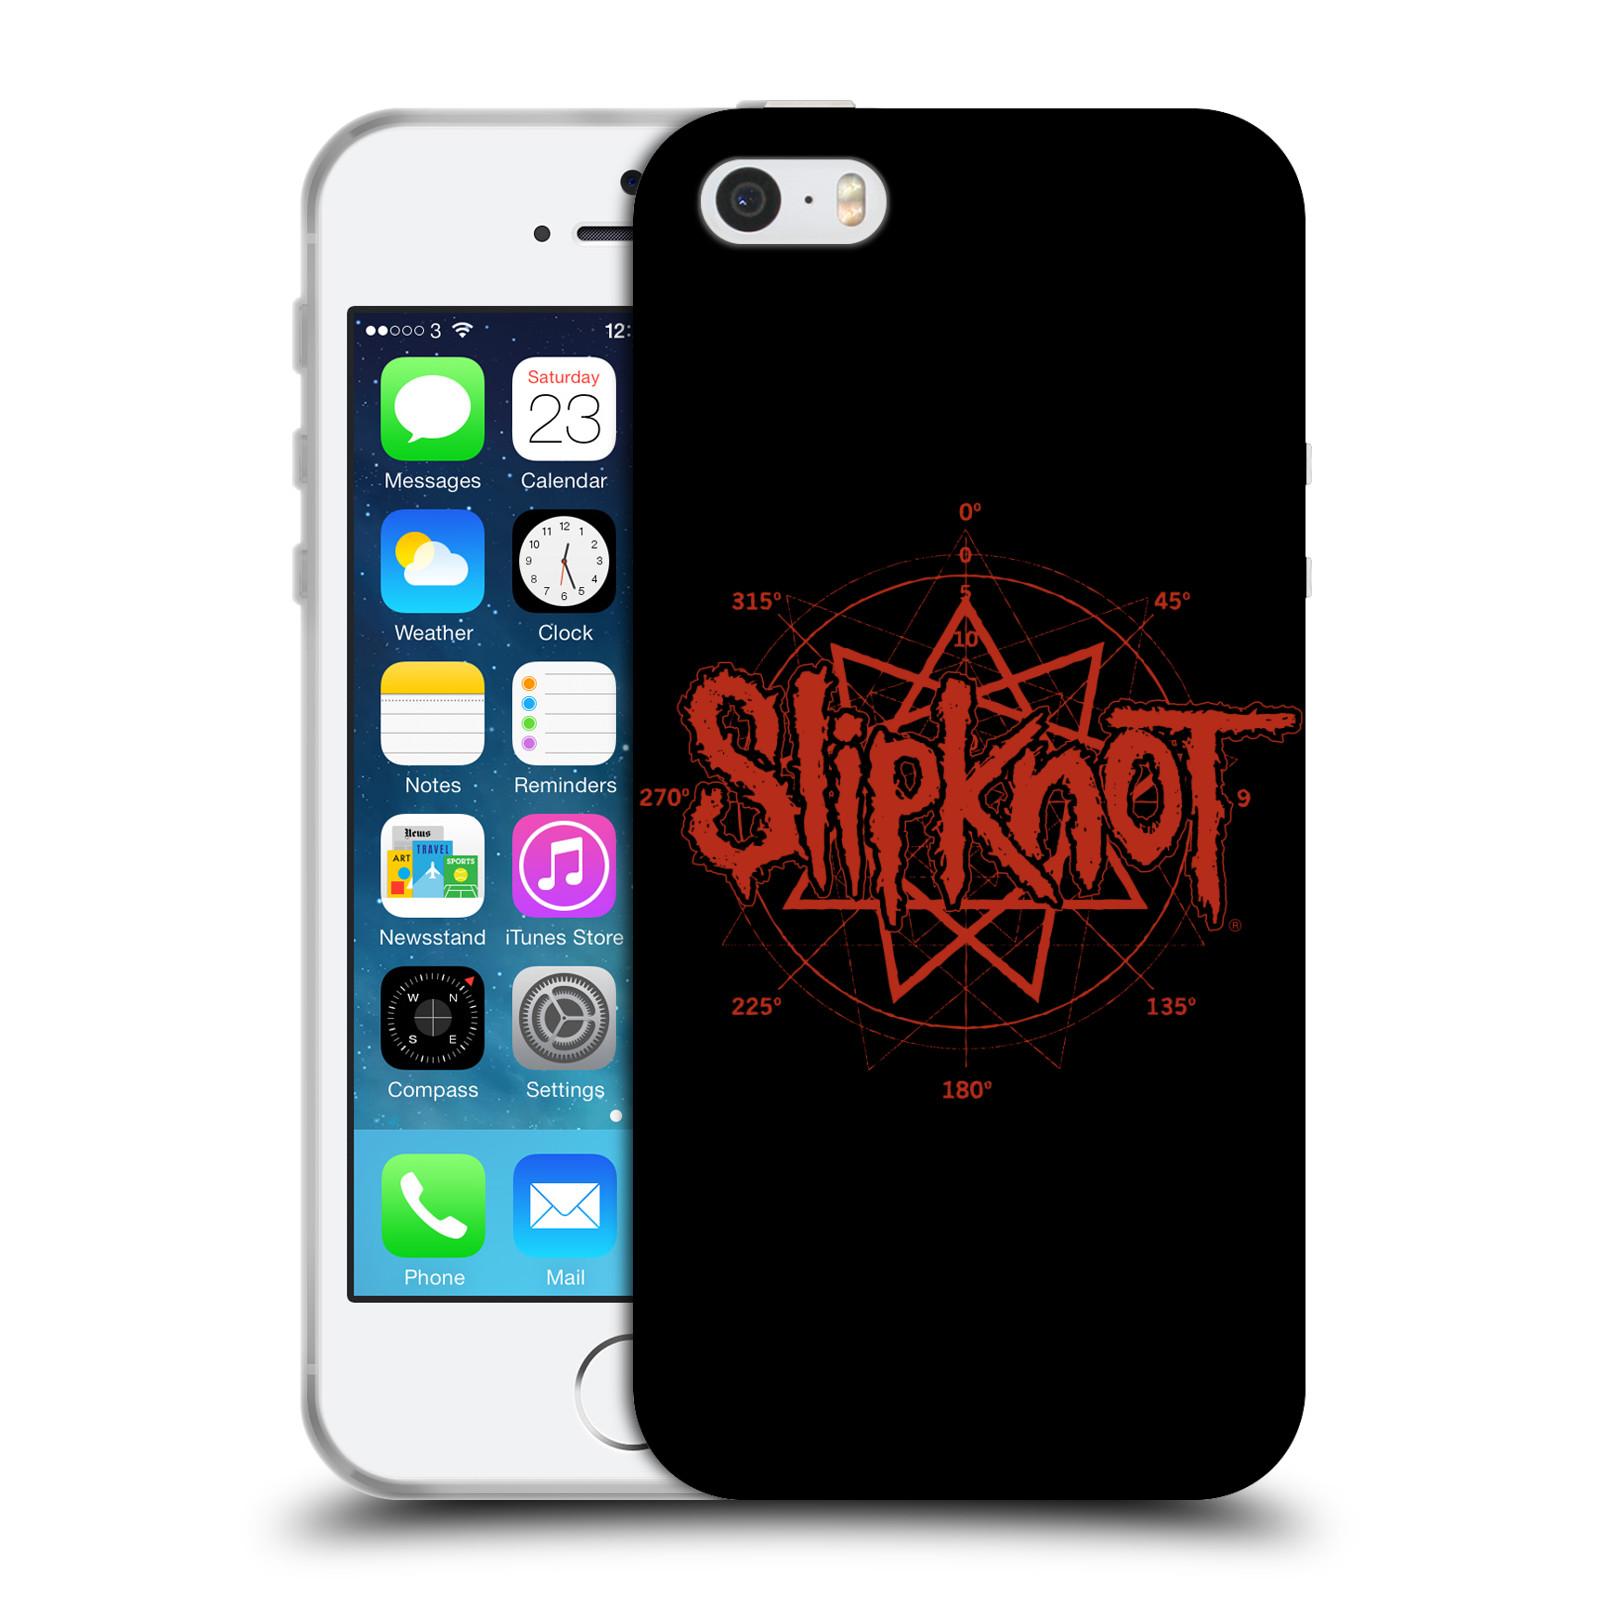 HEAD CASE silikonový obal na mobil Apple Iphone 5/5S hudební skupina Slipknot logo